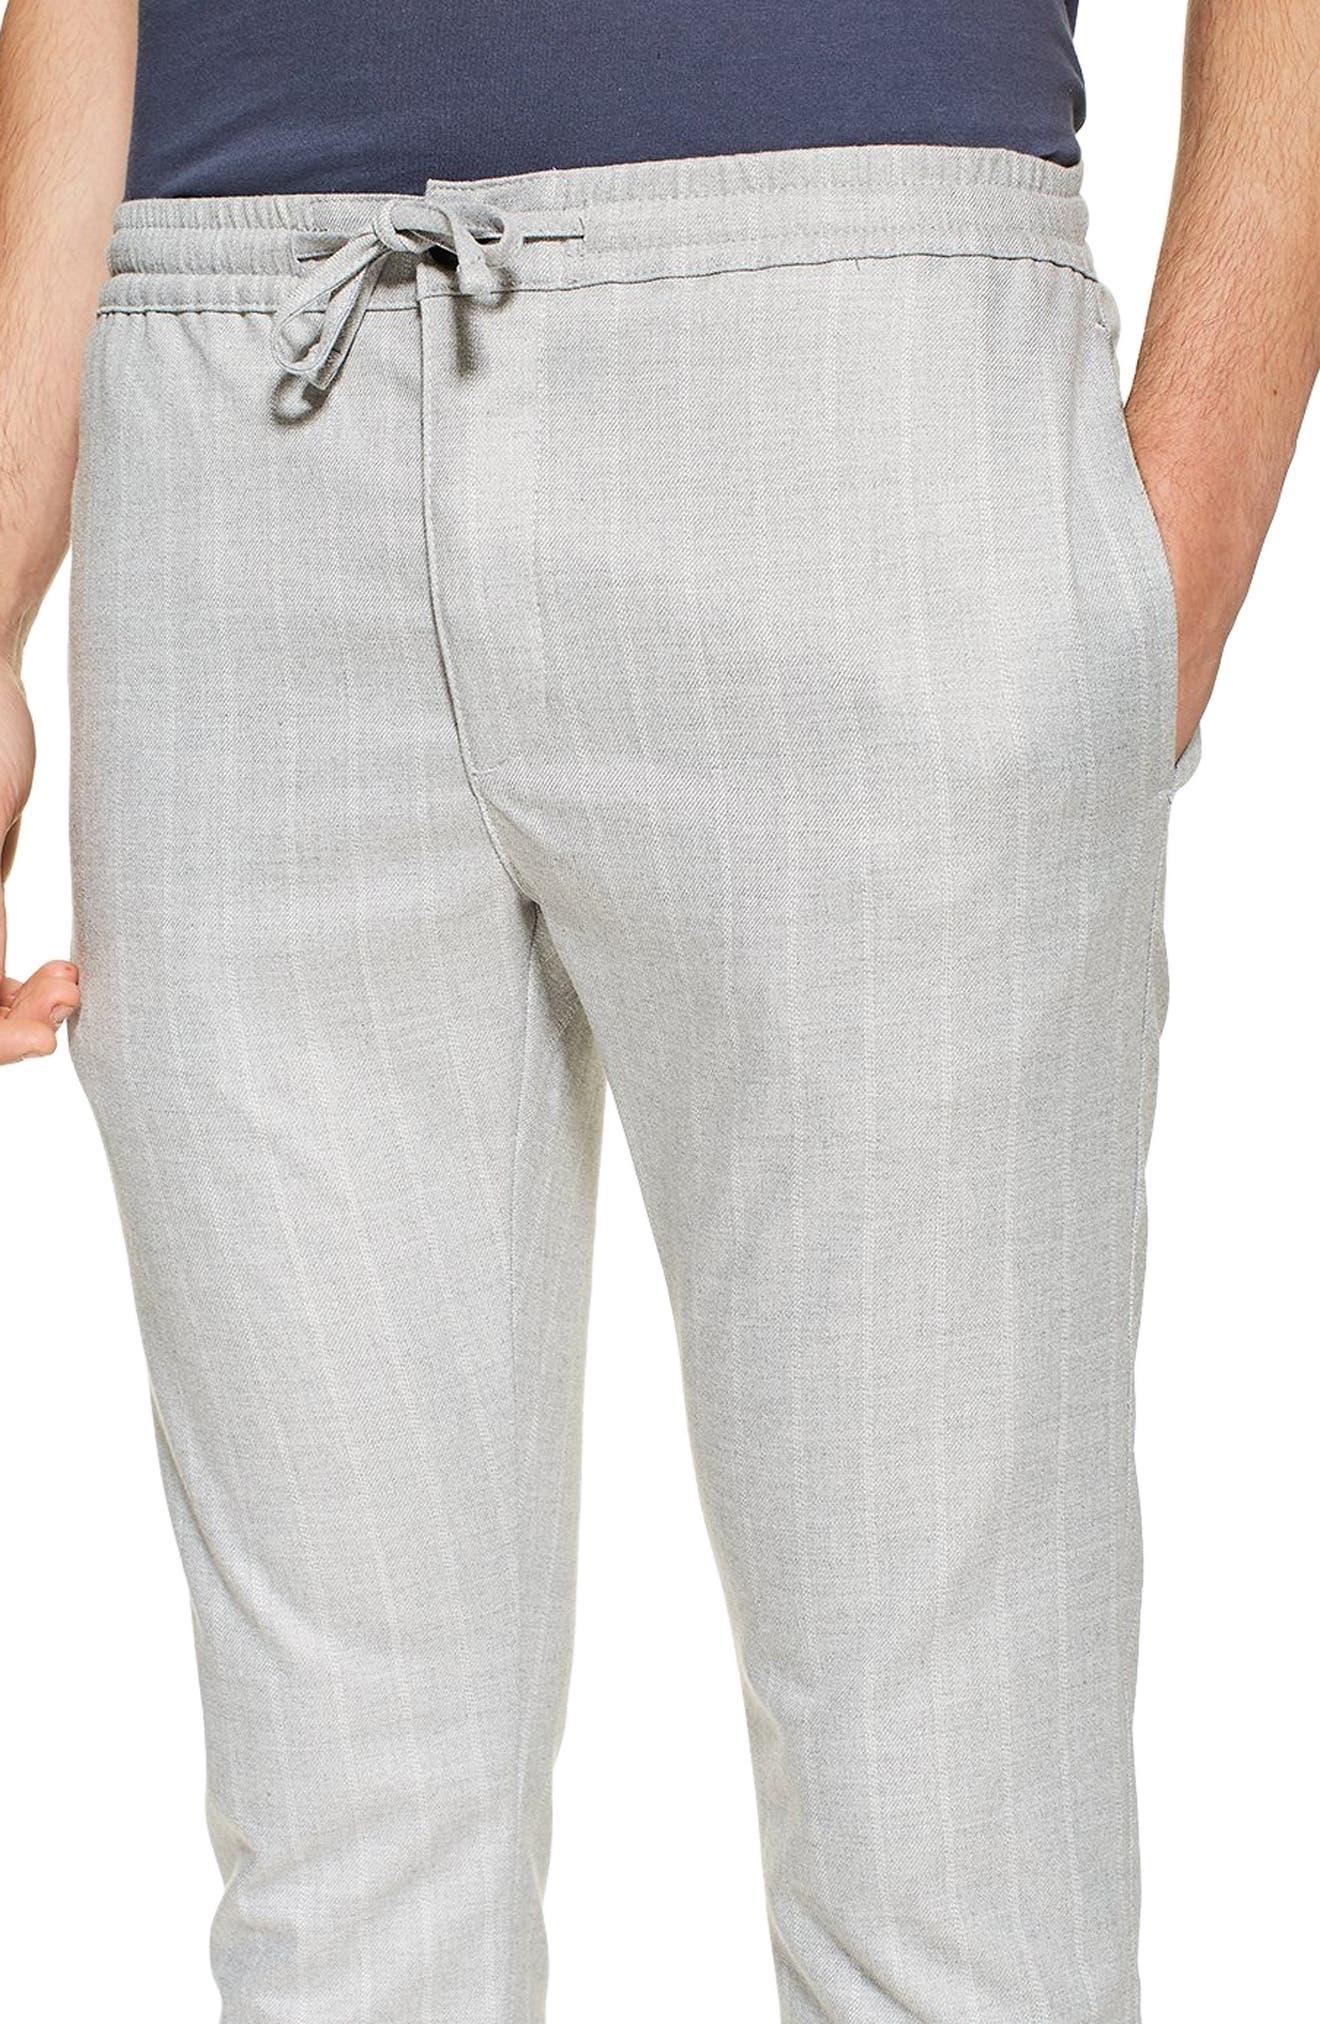 TOPMAN, Skinny Fit Stripe Crop Trousers, Alternate thumbnail 4, color, GREY